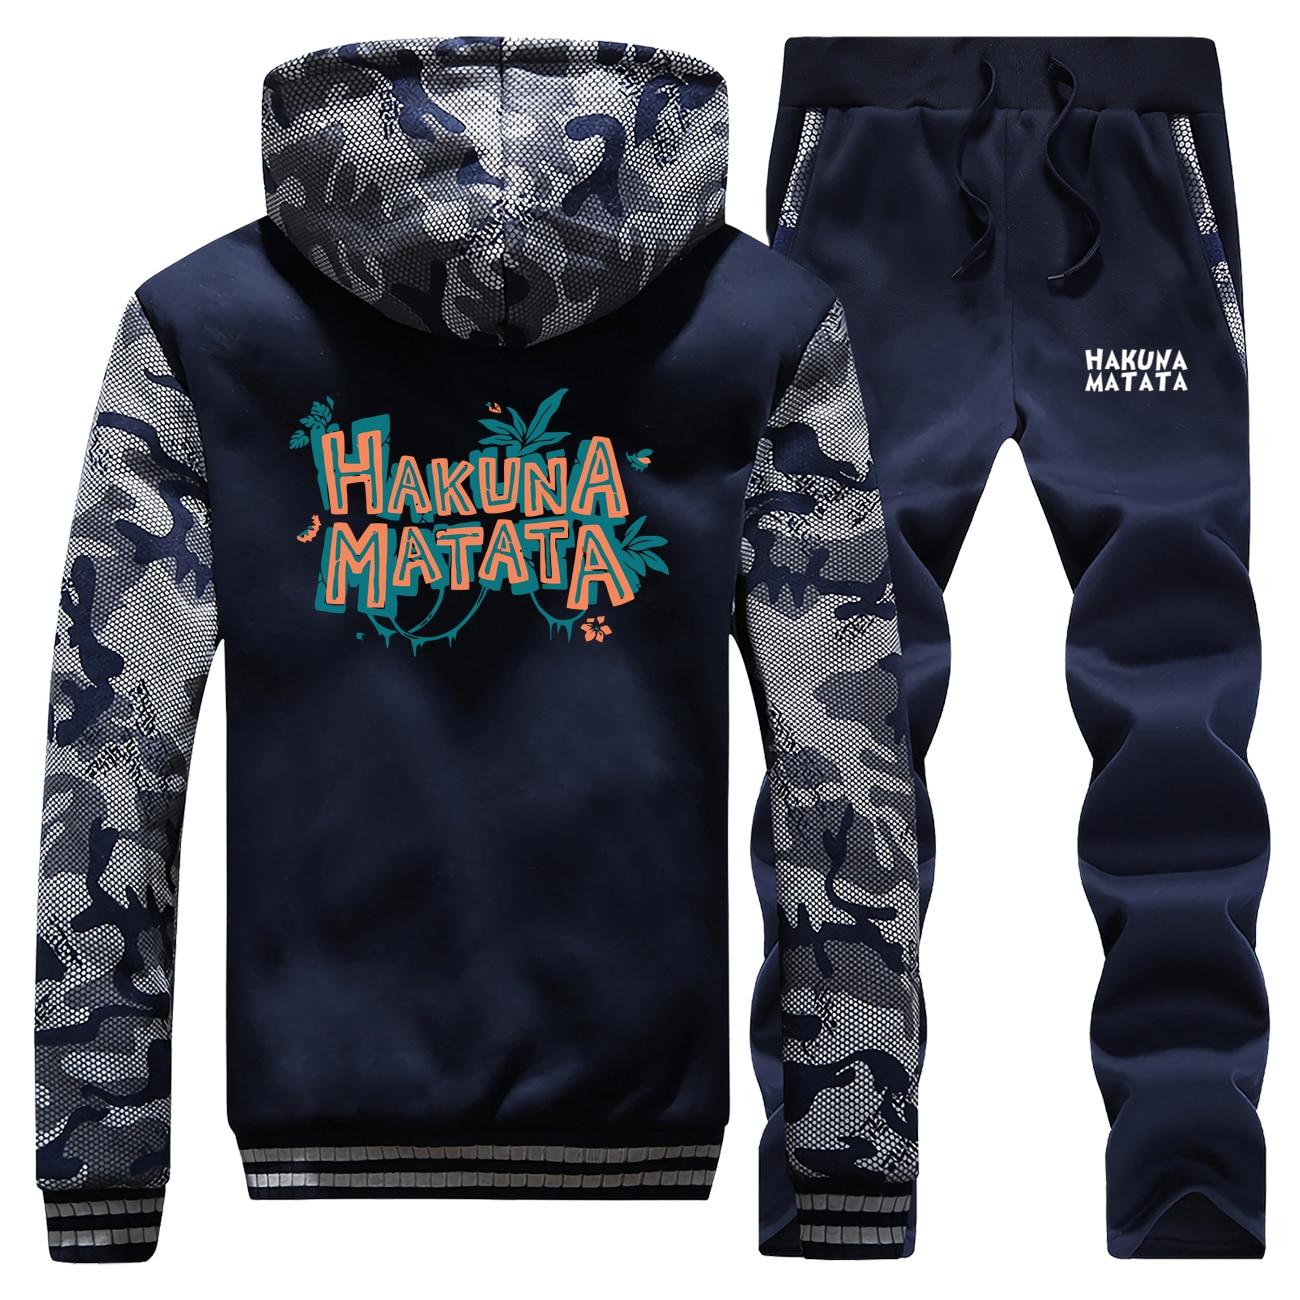 The Lion King Friends Sweatshirt+Sweatpants Mens Hakuna Matata Cartoon Thick Hoodies Hip Hop Zip Men Jacket Harajuku Tracksuit